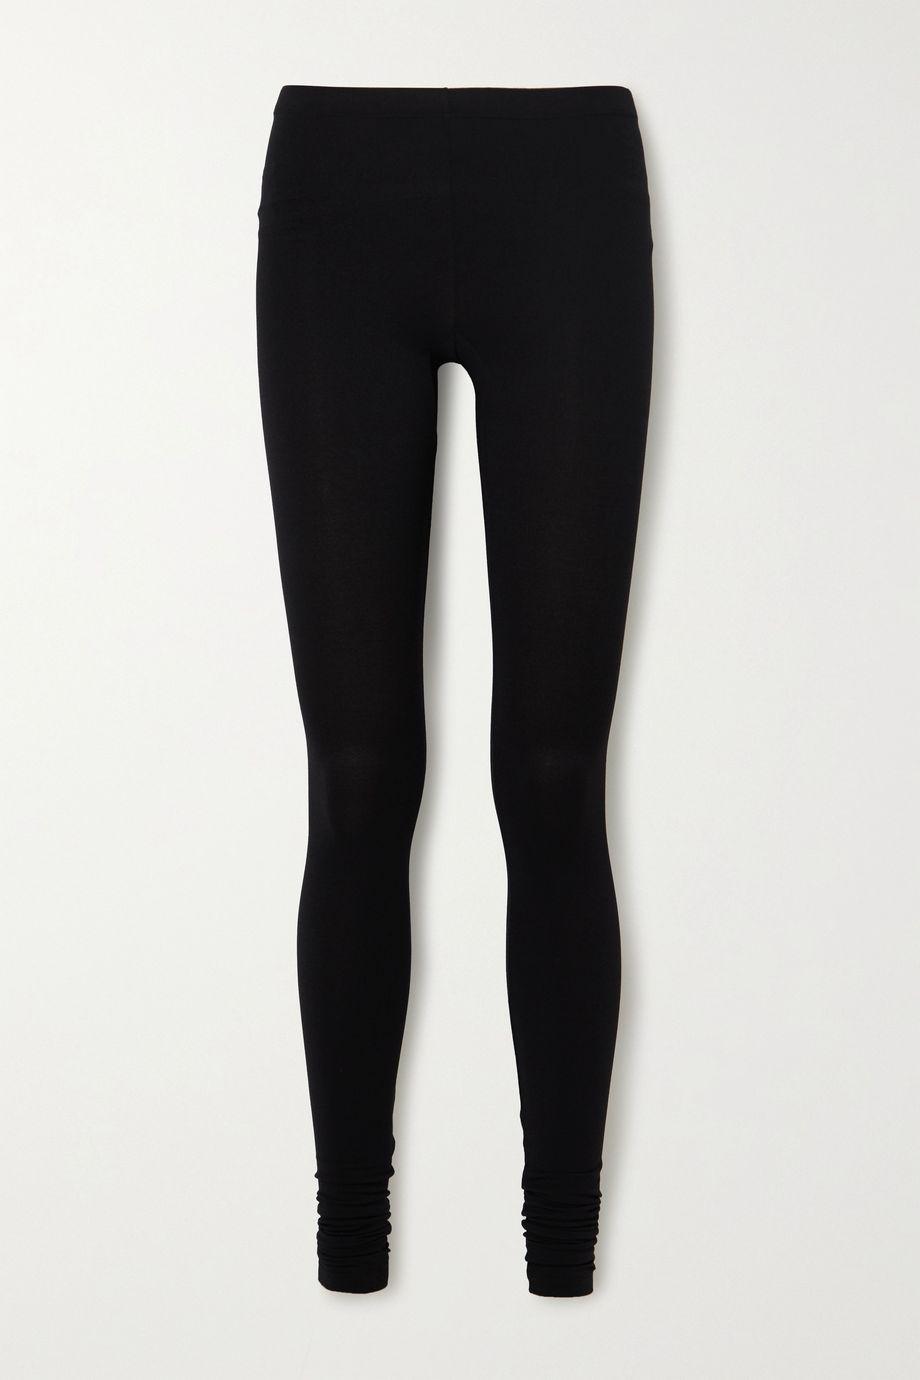 Rick Owens Lilies stretch-jersey leggings